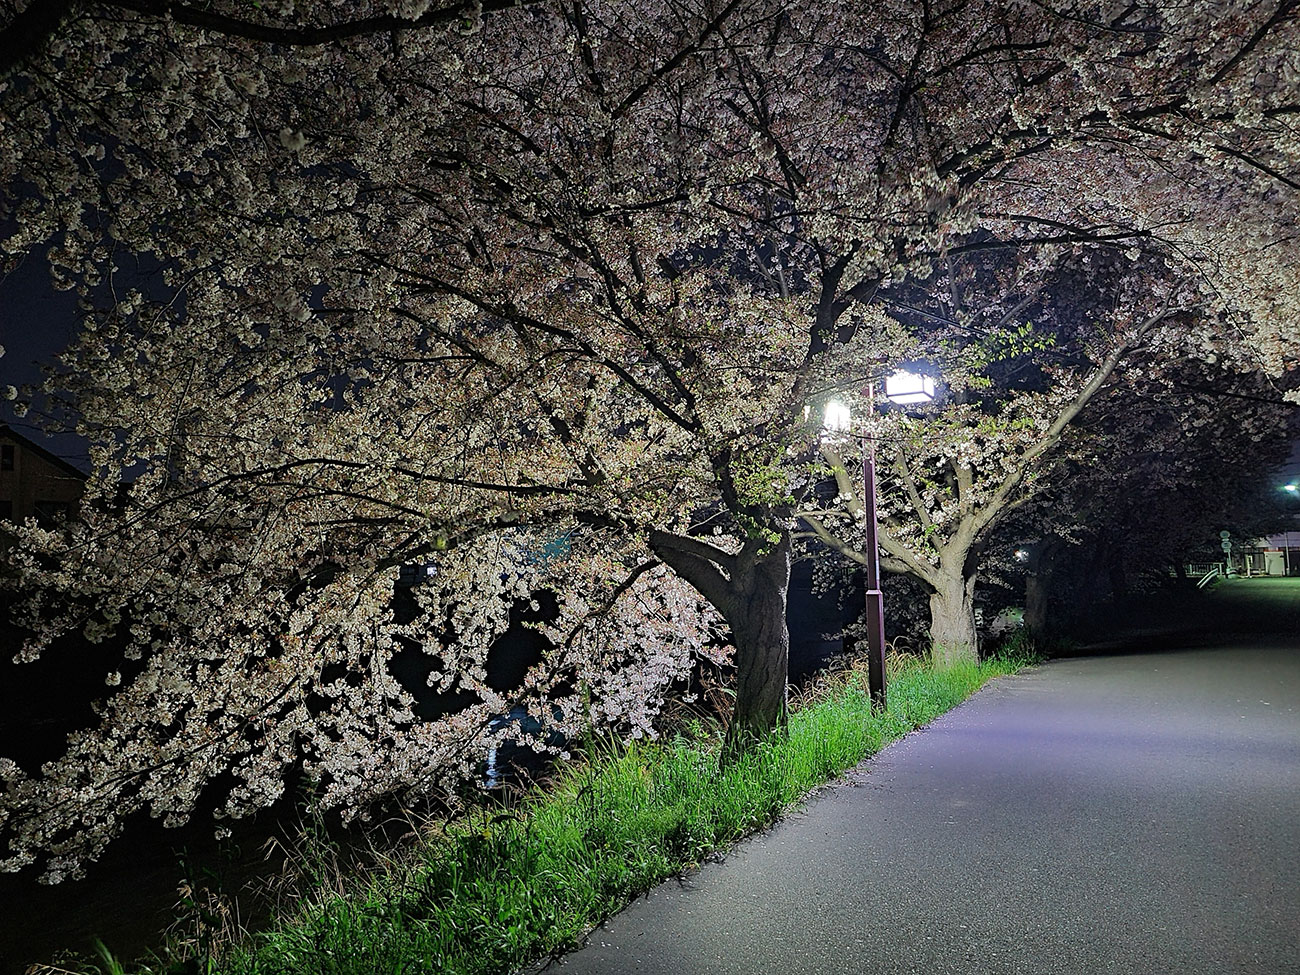 Galaxy S20Plusのナイトモードで撮影した夜桜